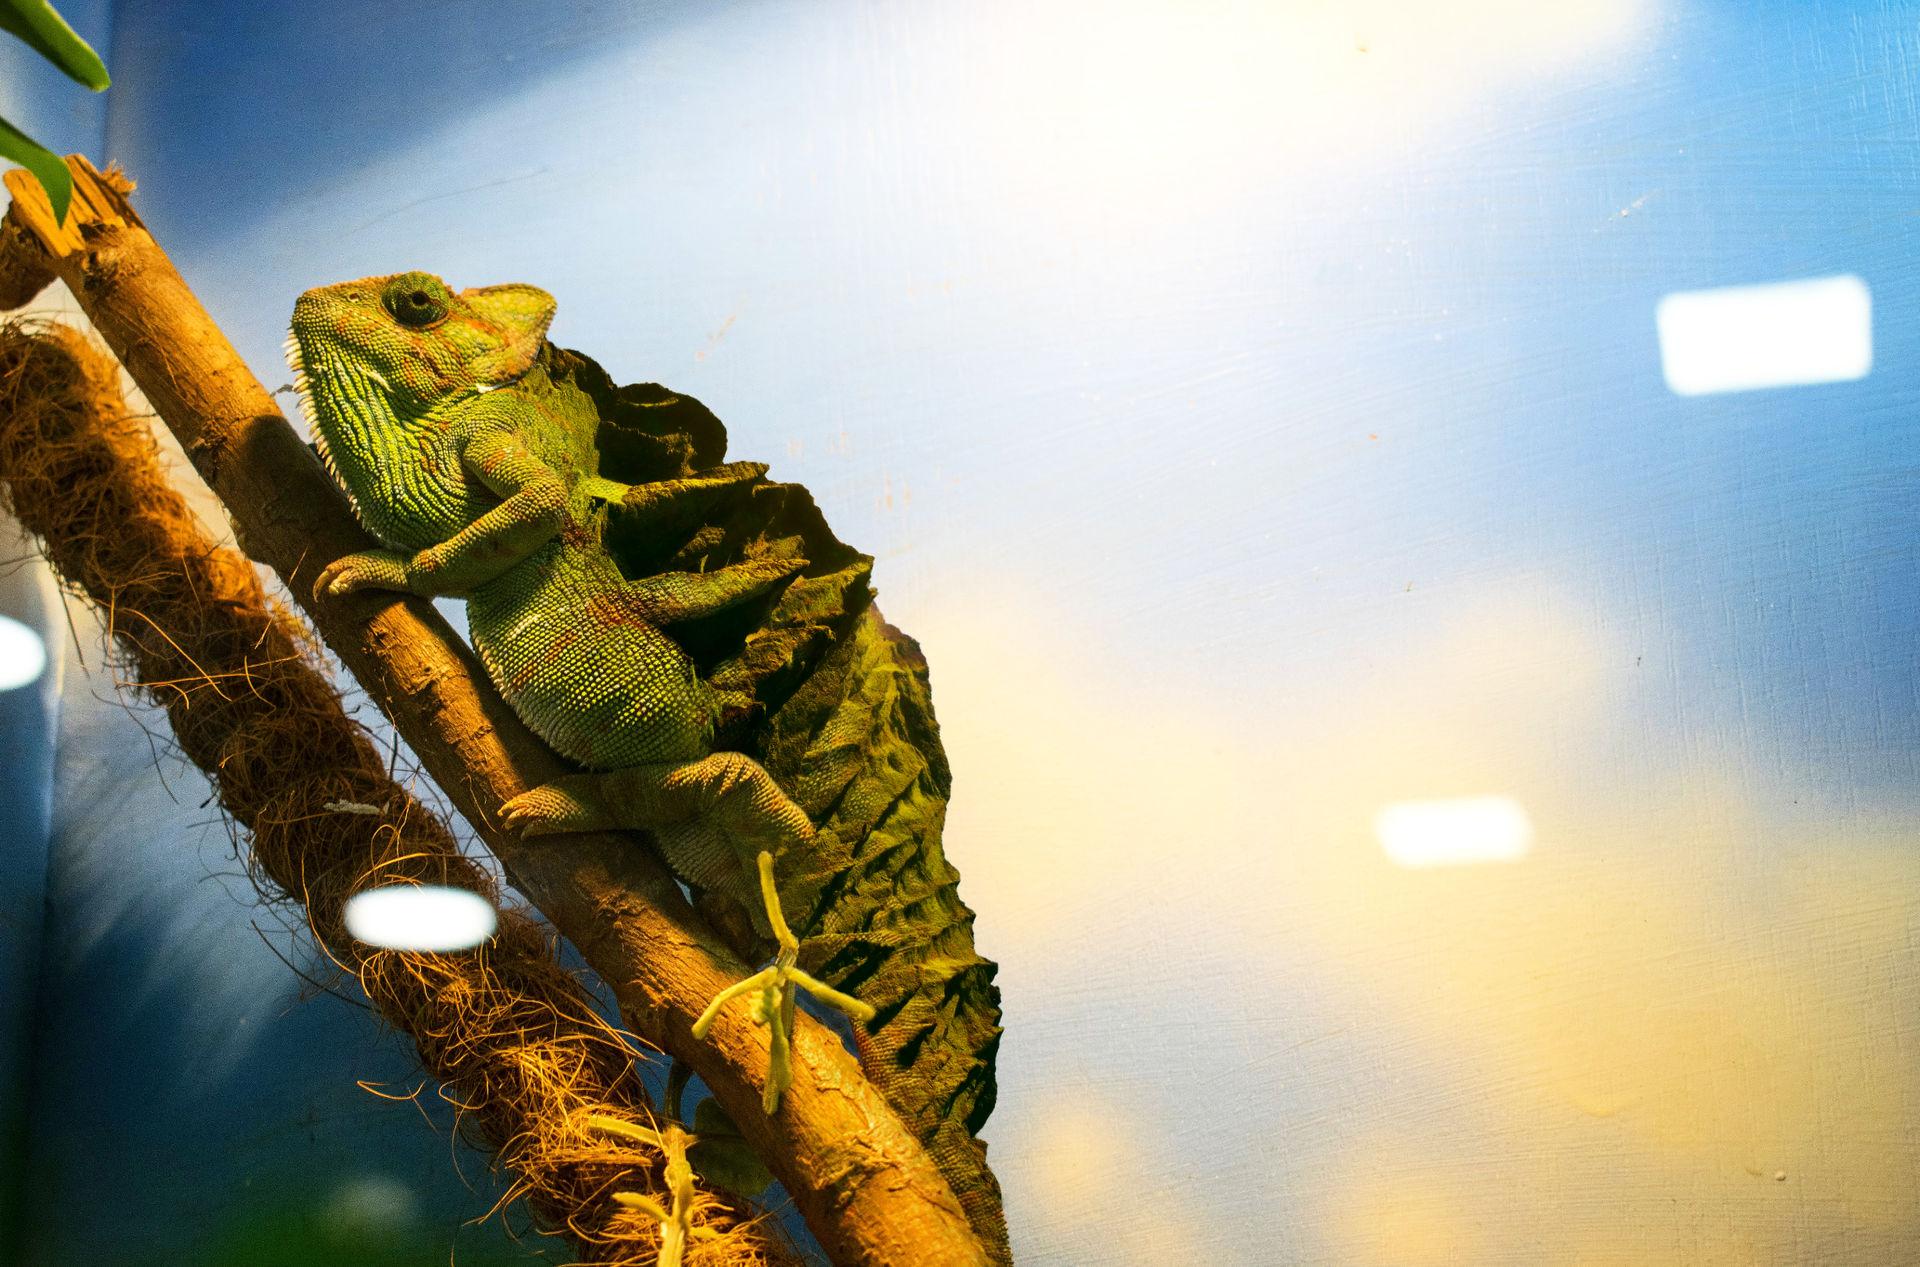 MountainBack Chameleon